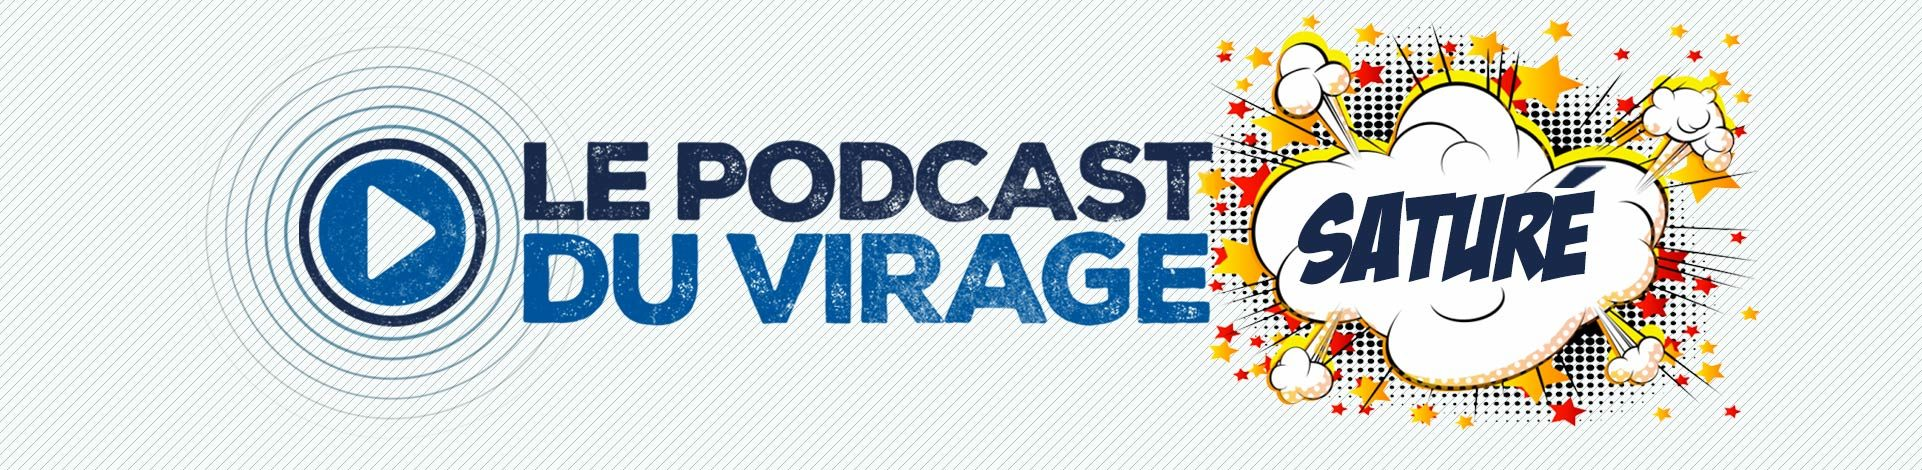 Le podcast #17 Virage PSG